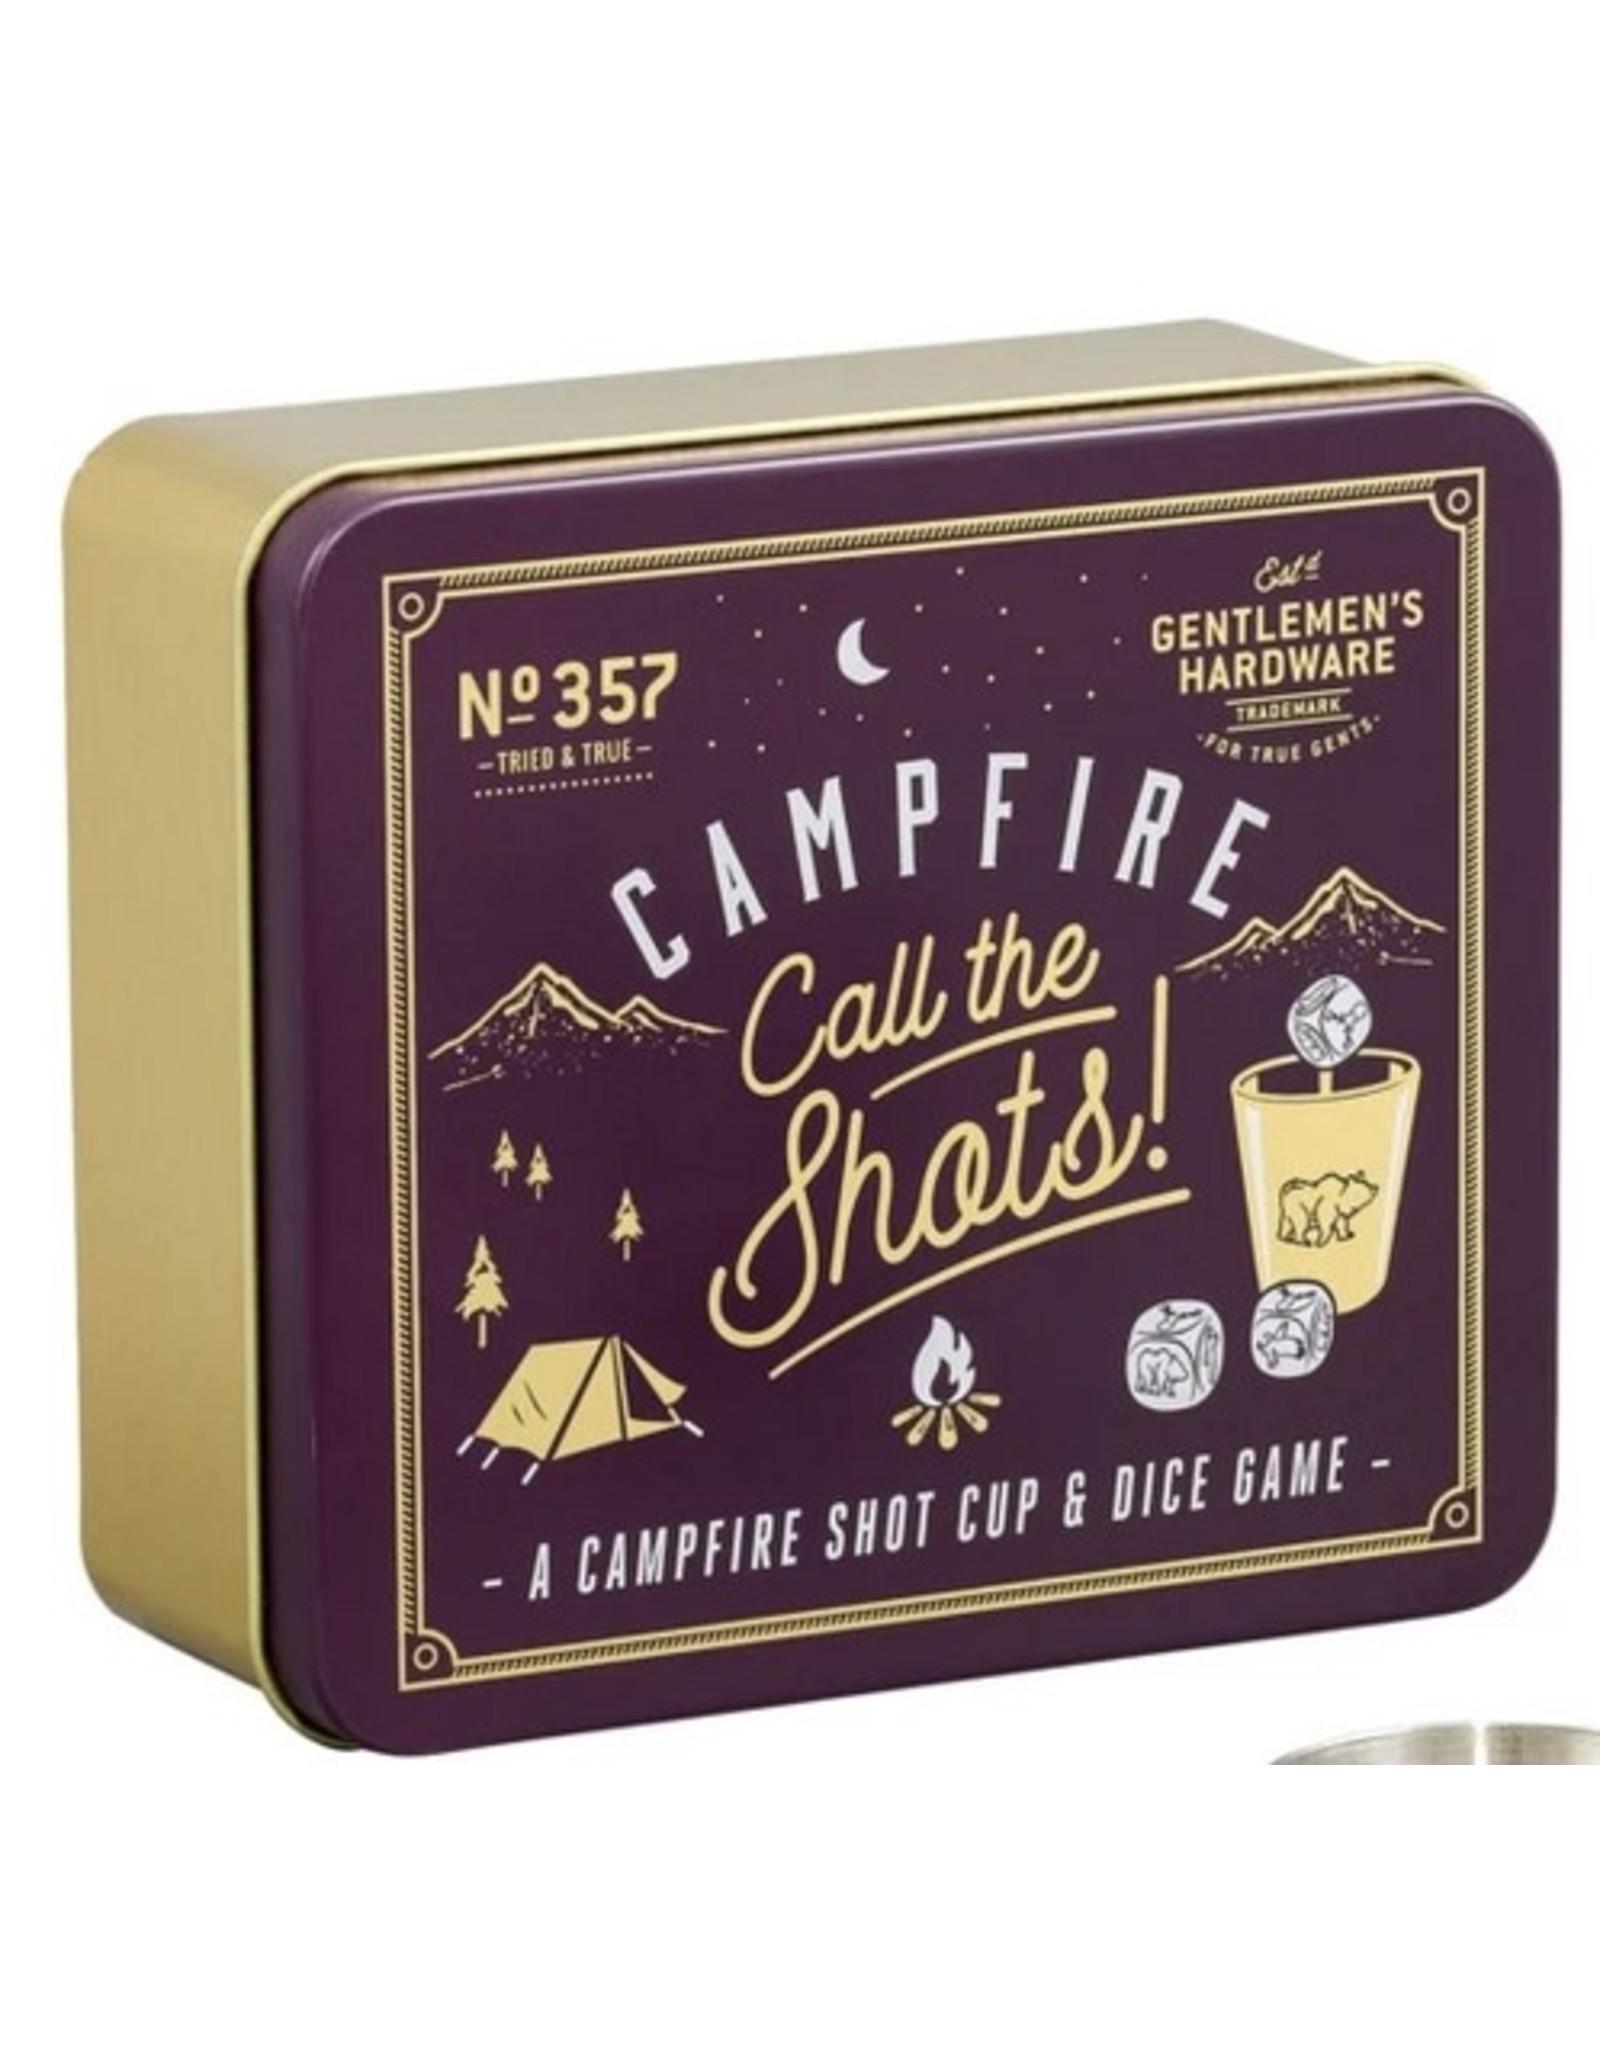 Gentlemen's Hardware Campfire Call The Shots Game